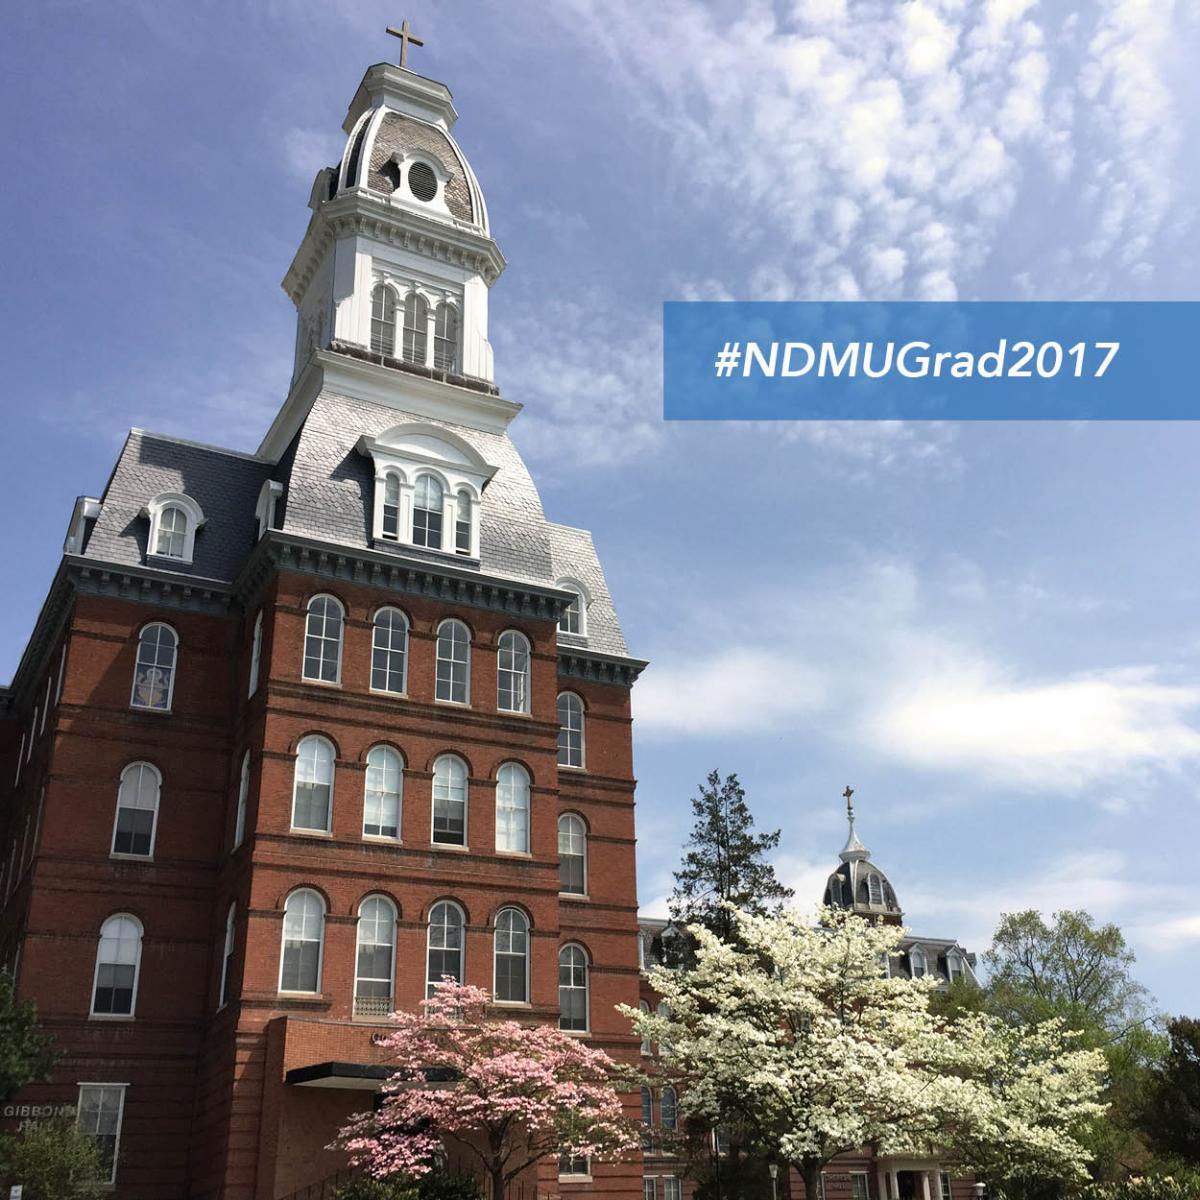 NDMUGrad2017  Notre Dame of Maryland University